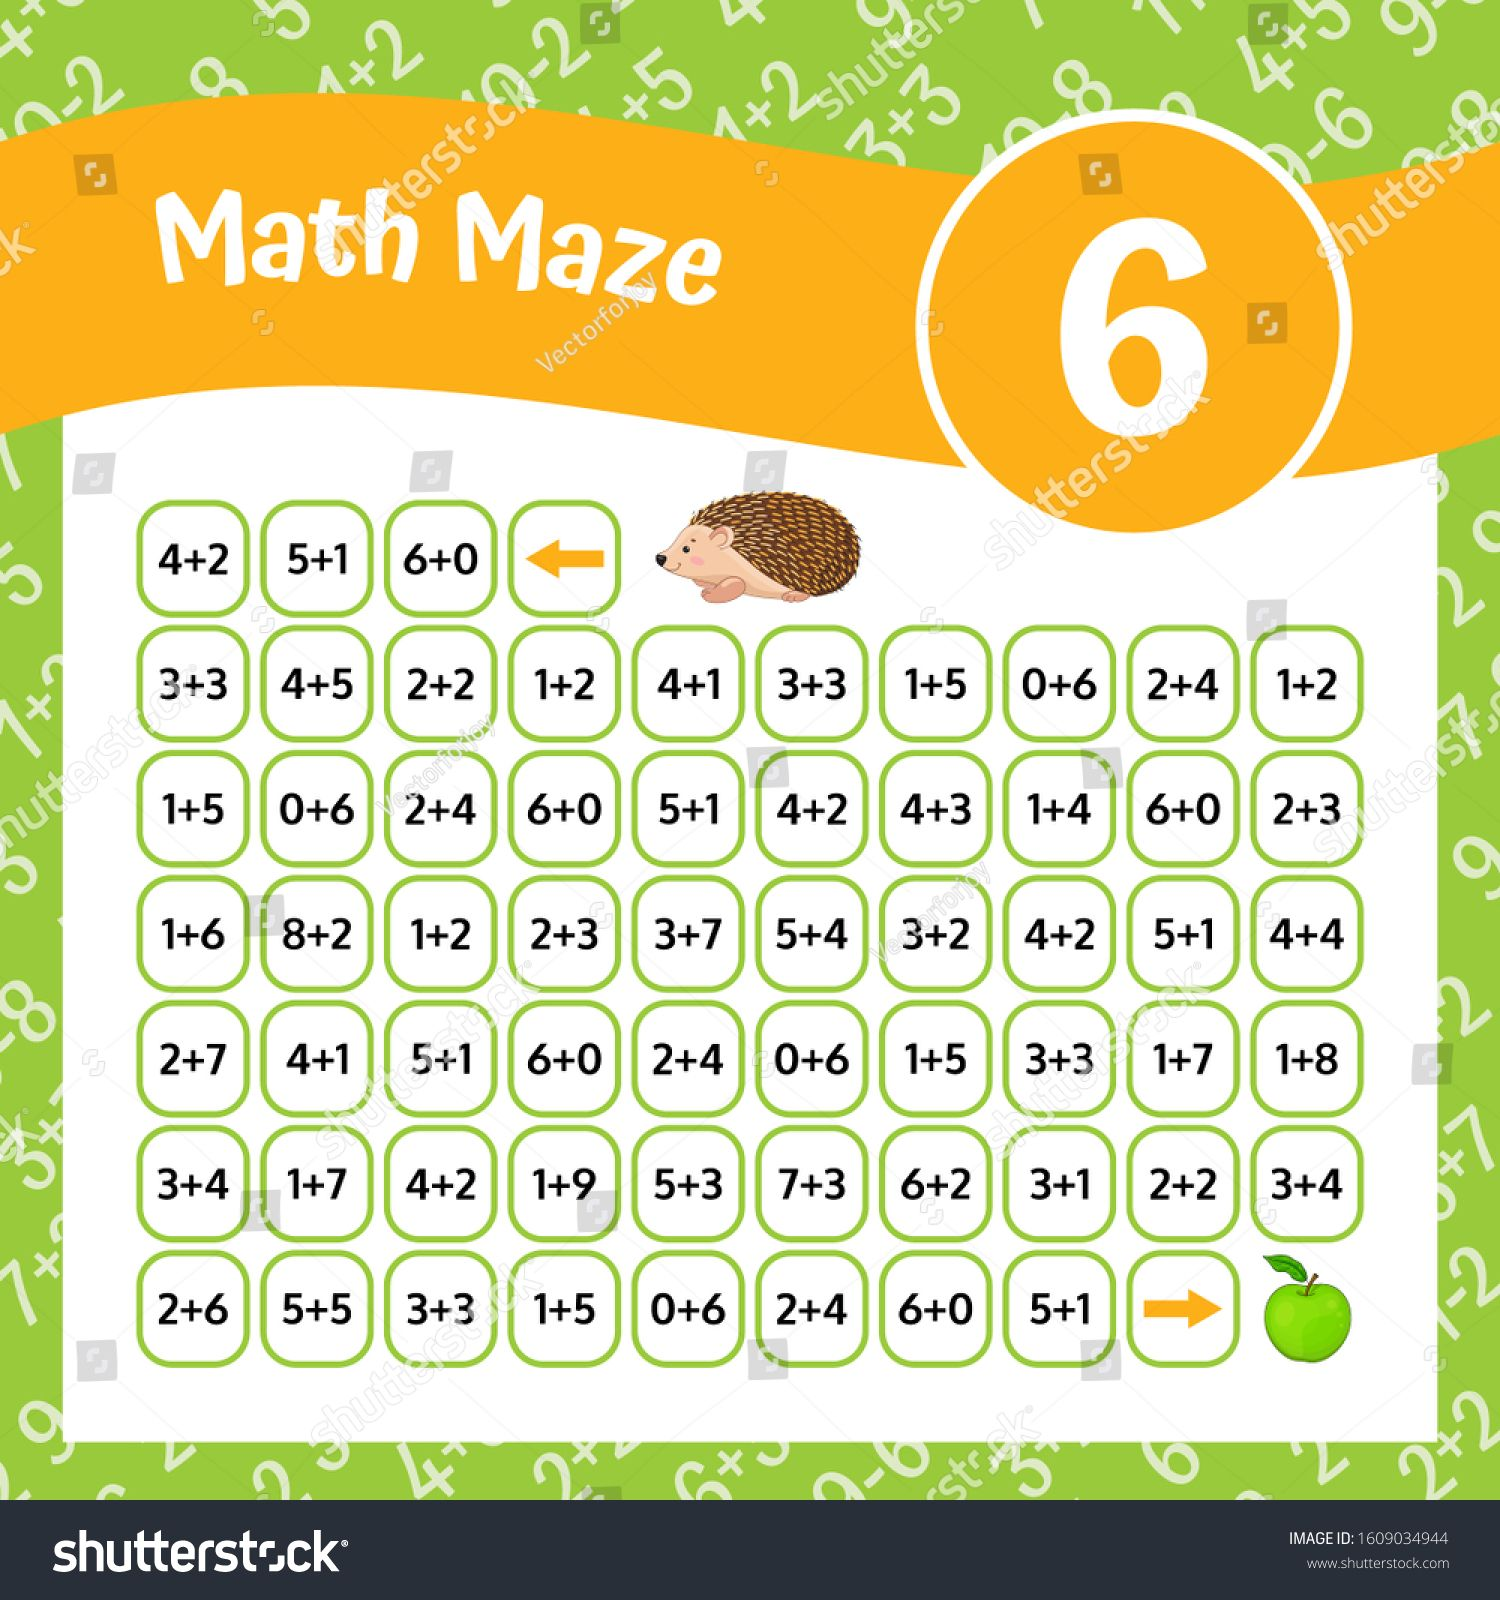 Math Maze Addition Worksheet Educational Game Mathematical Puzzle Ad Spon Addition Worksheet Math Maze Math Maze Addition Worksheets Math